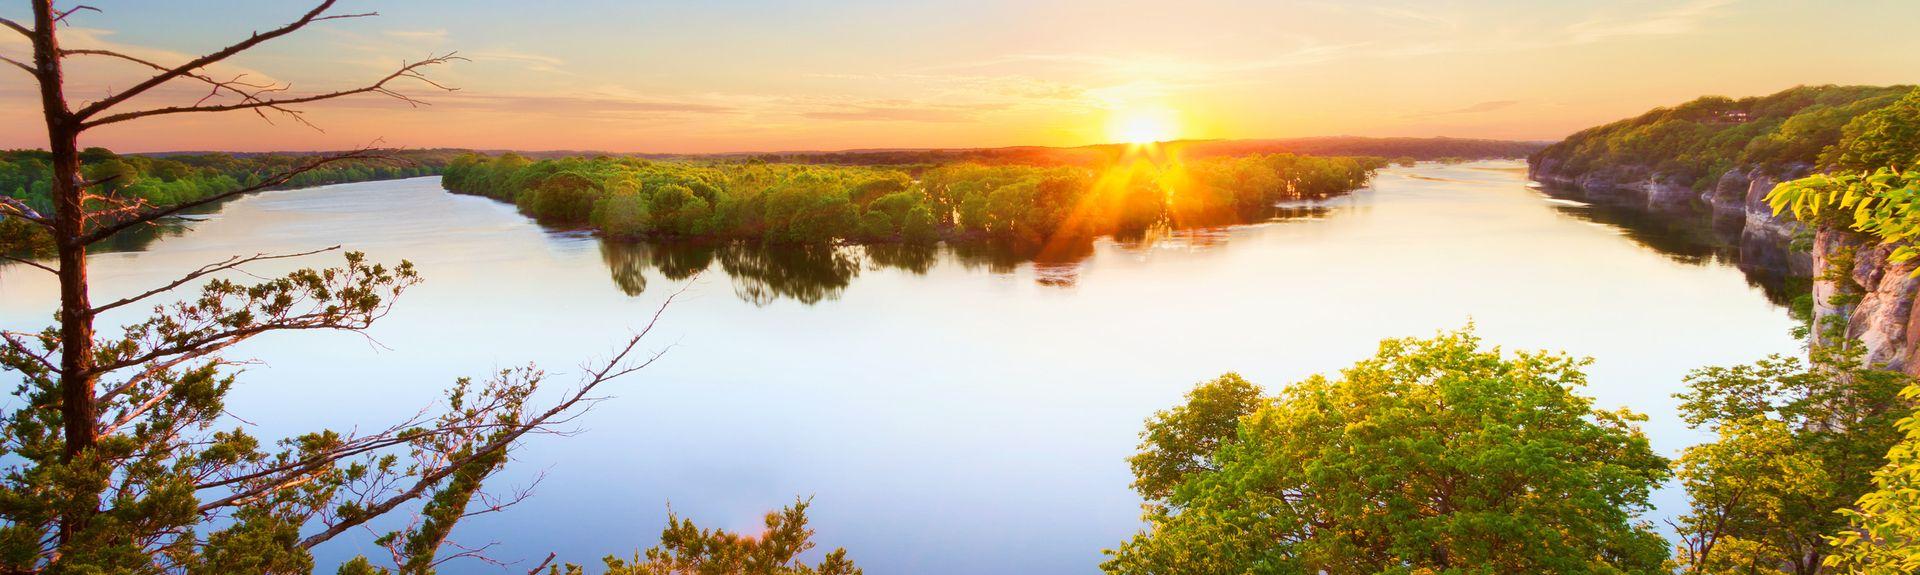 Lake Ozark, Missouri, Stati Uniti d'America